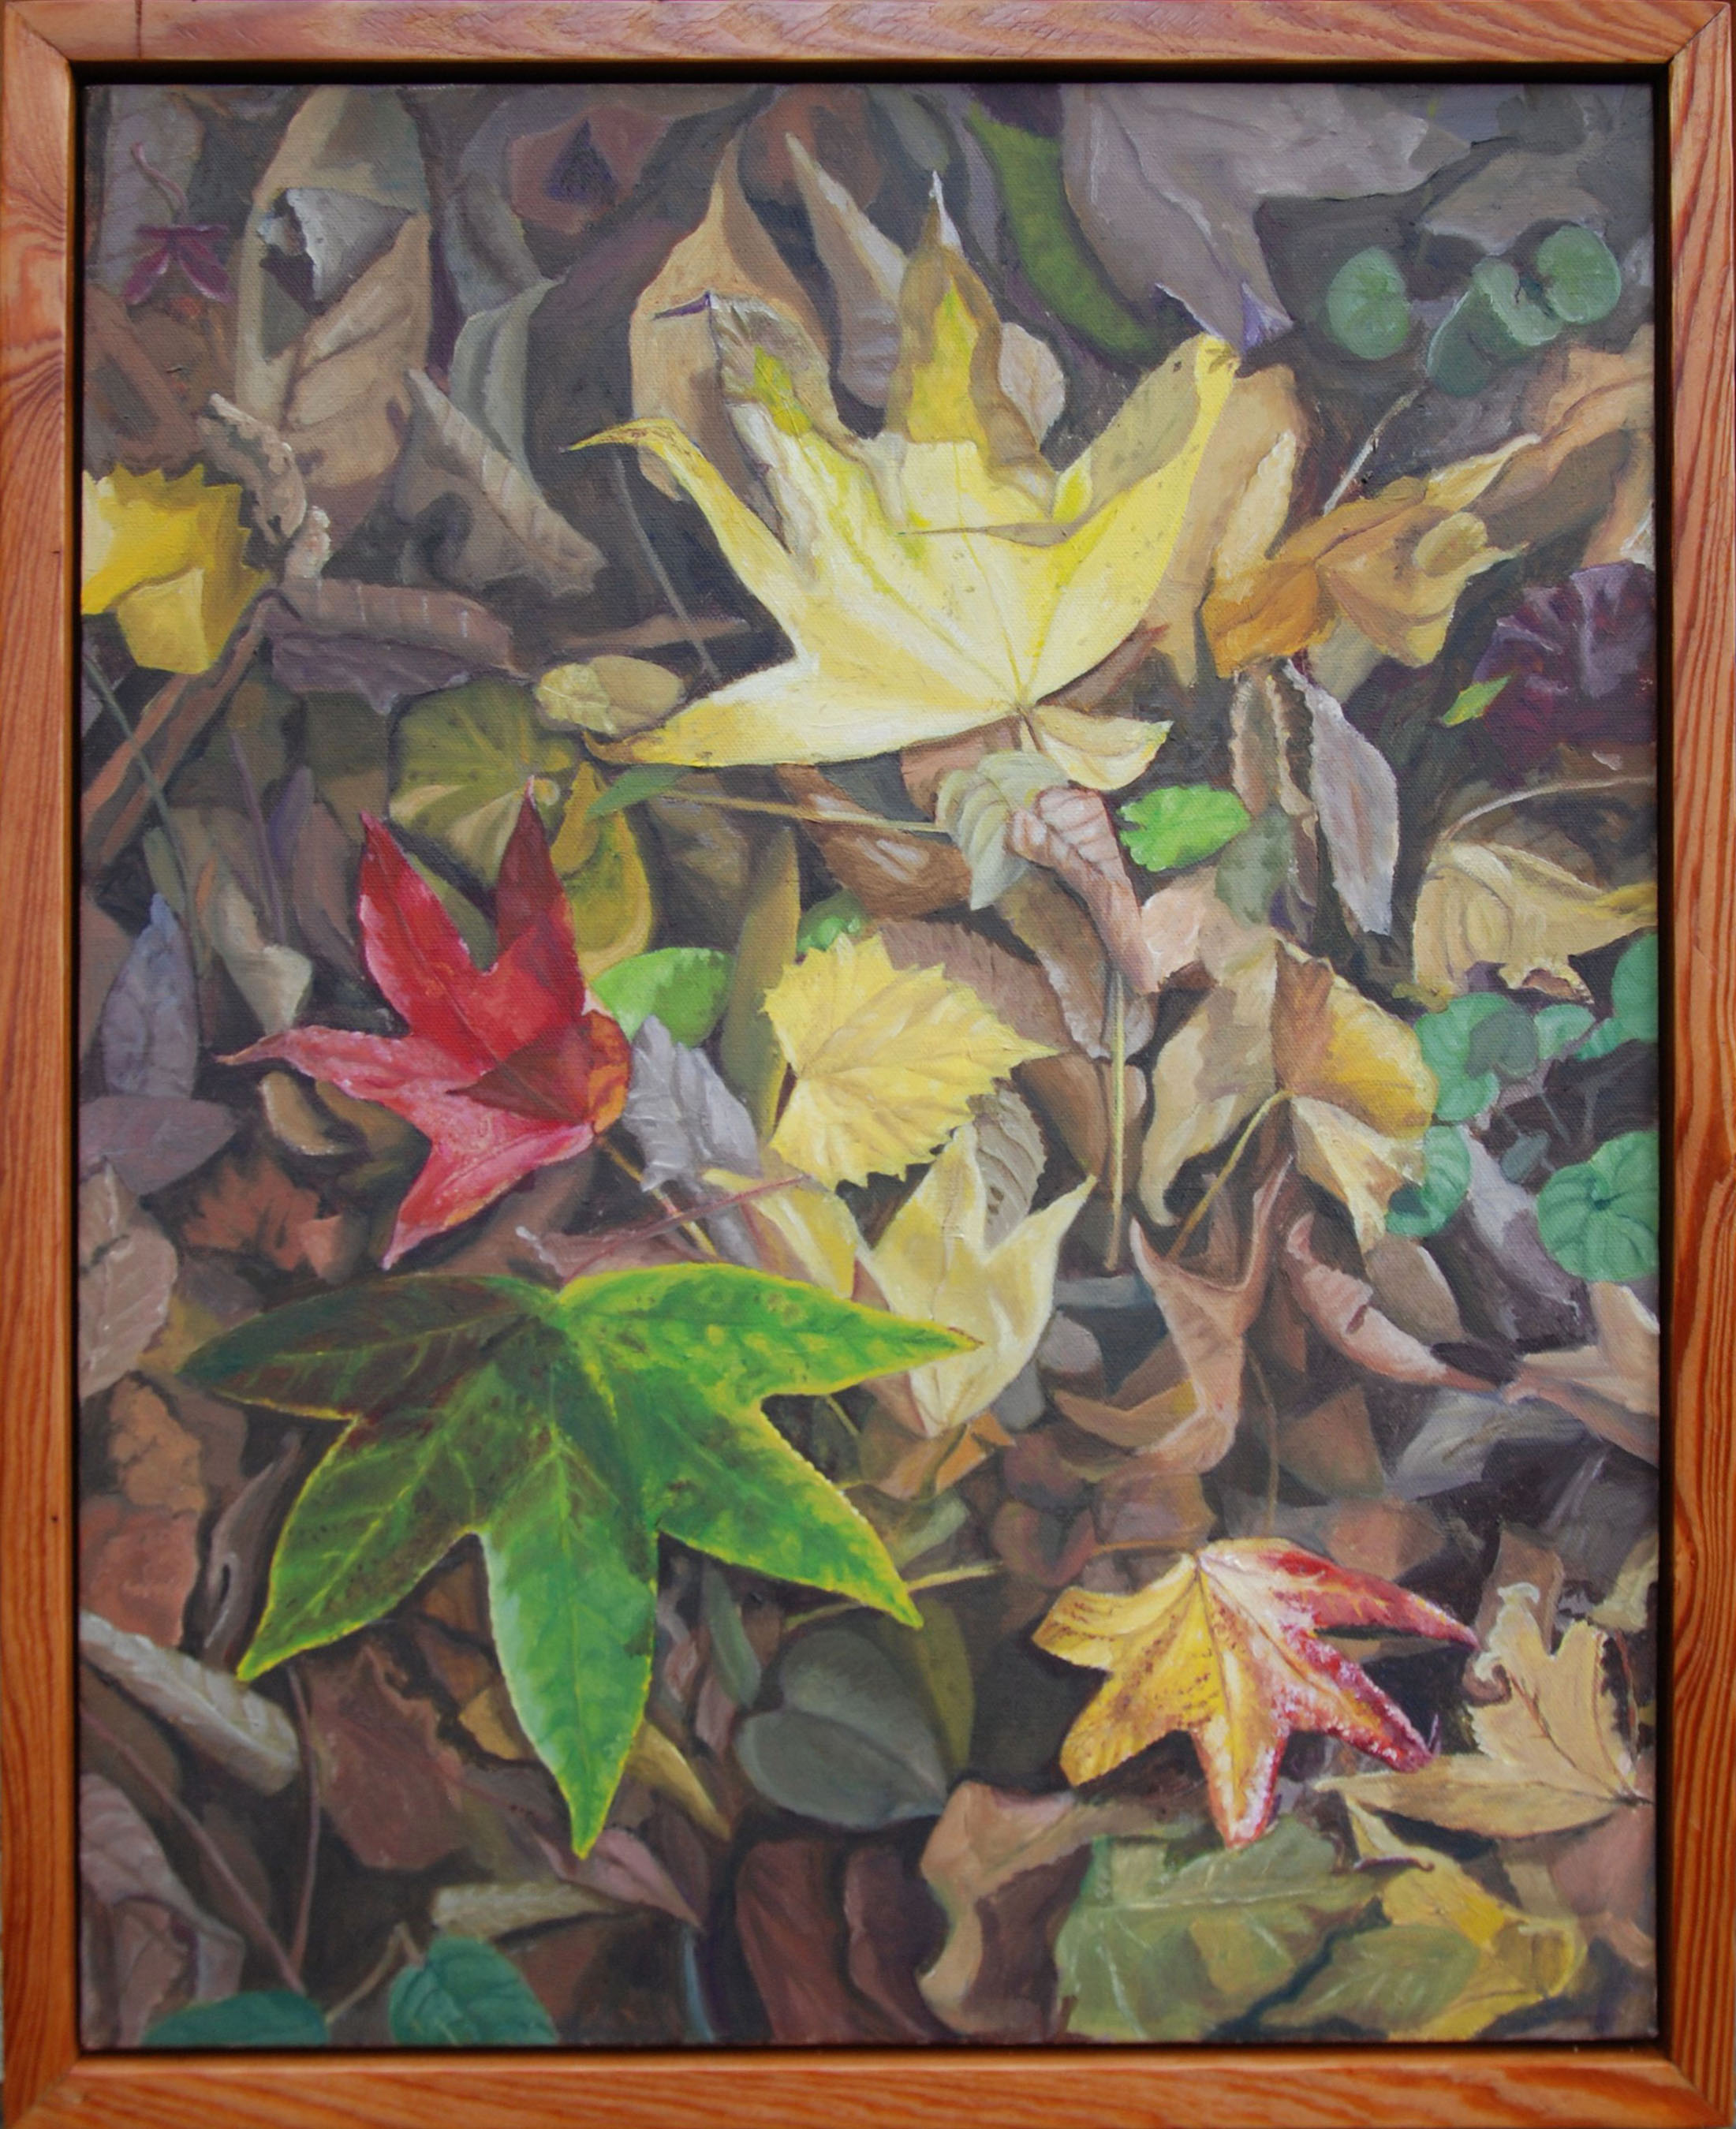 "An Autumn Walk Through San Felasco Hammock #3 of 6  oil on canvas, 22 x 28""; 2010; artist's collection"